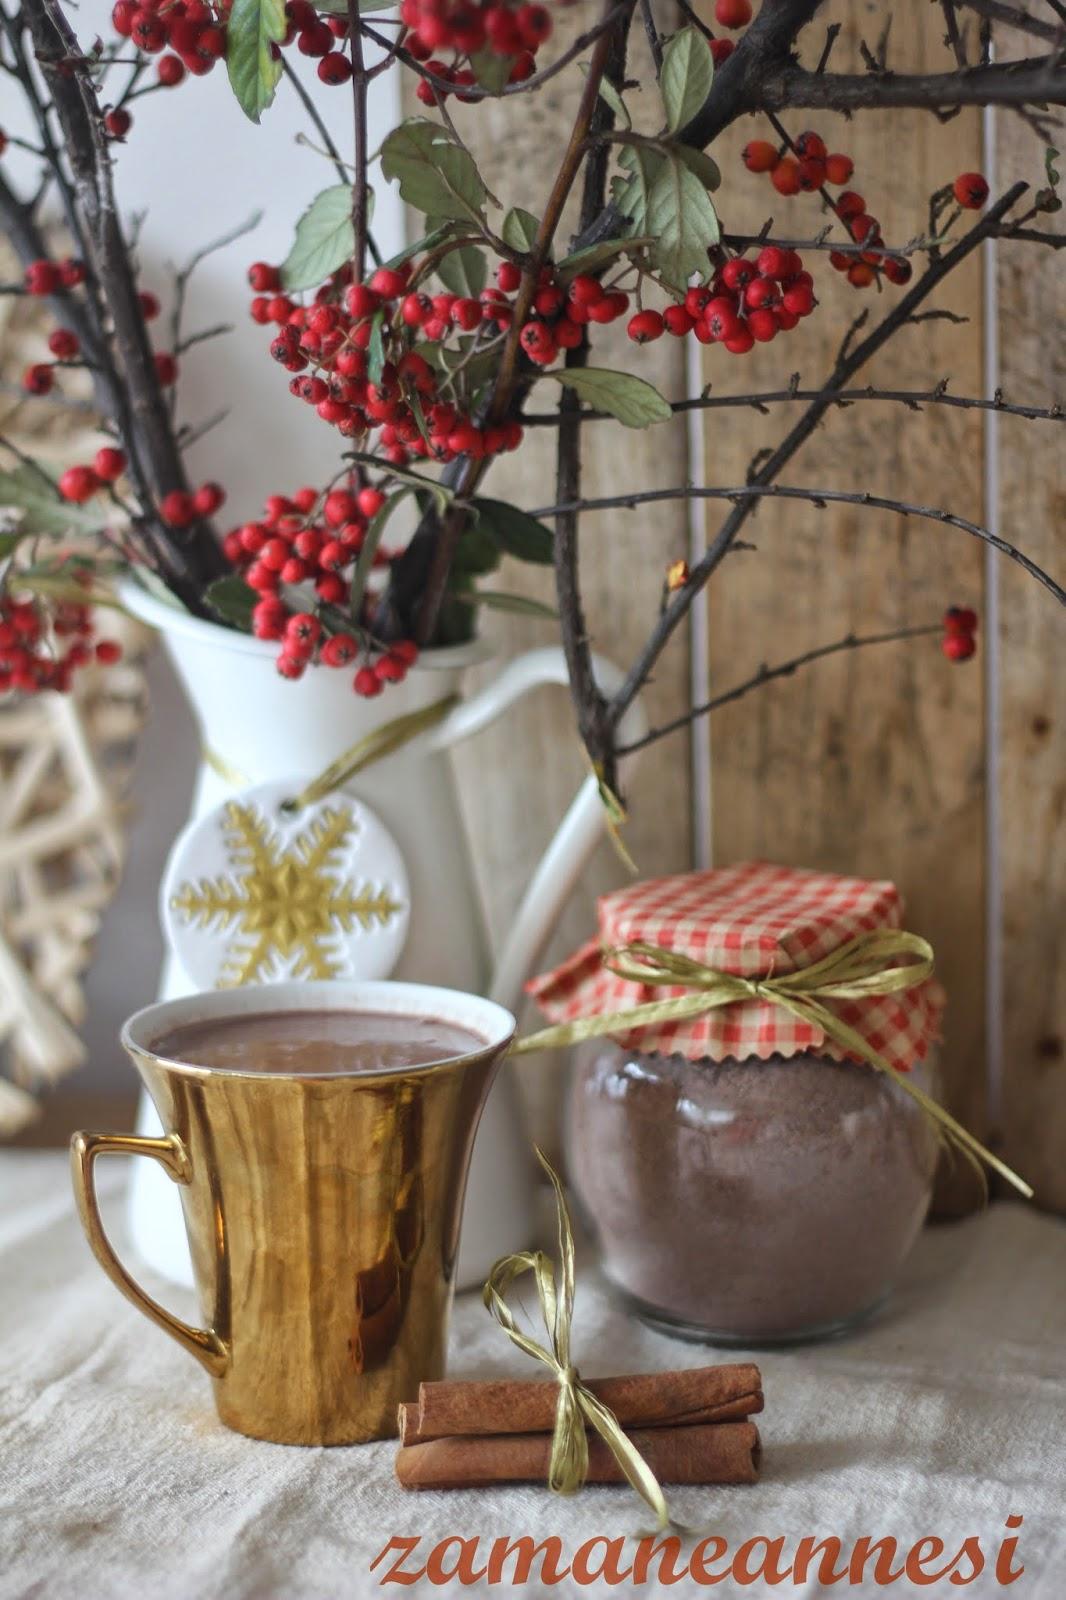 Karanfilli sıcak çikolata tarifi